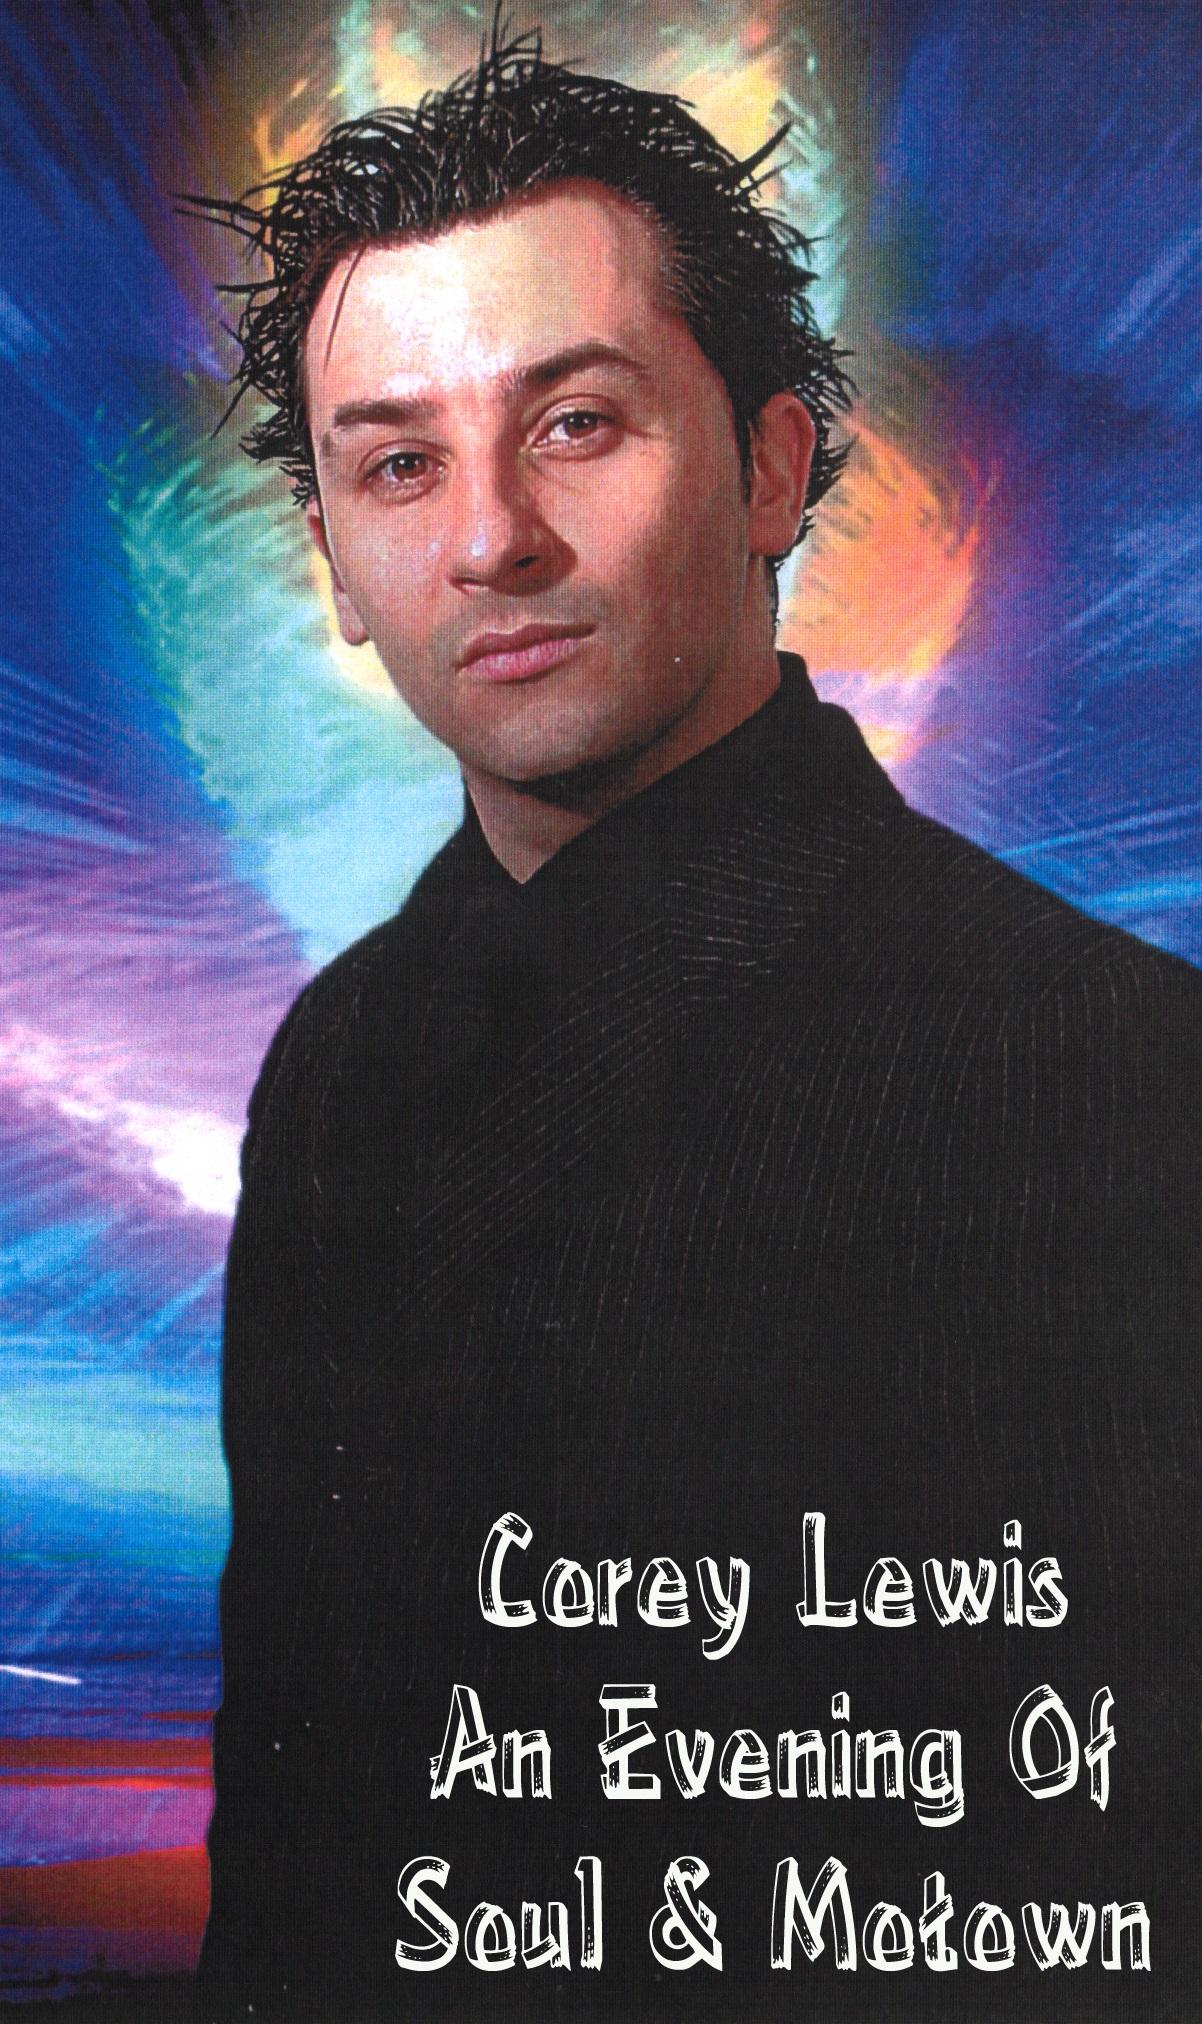 Corey Lewis